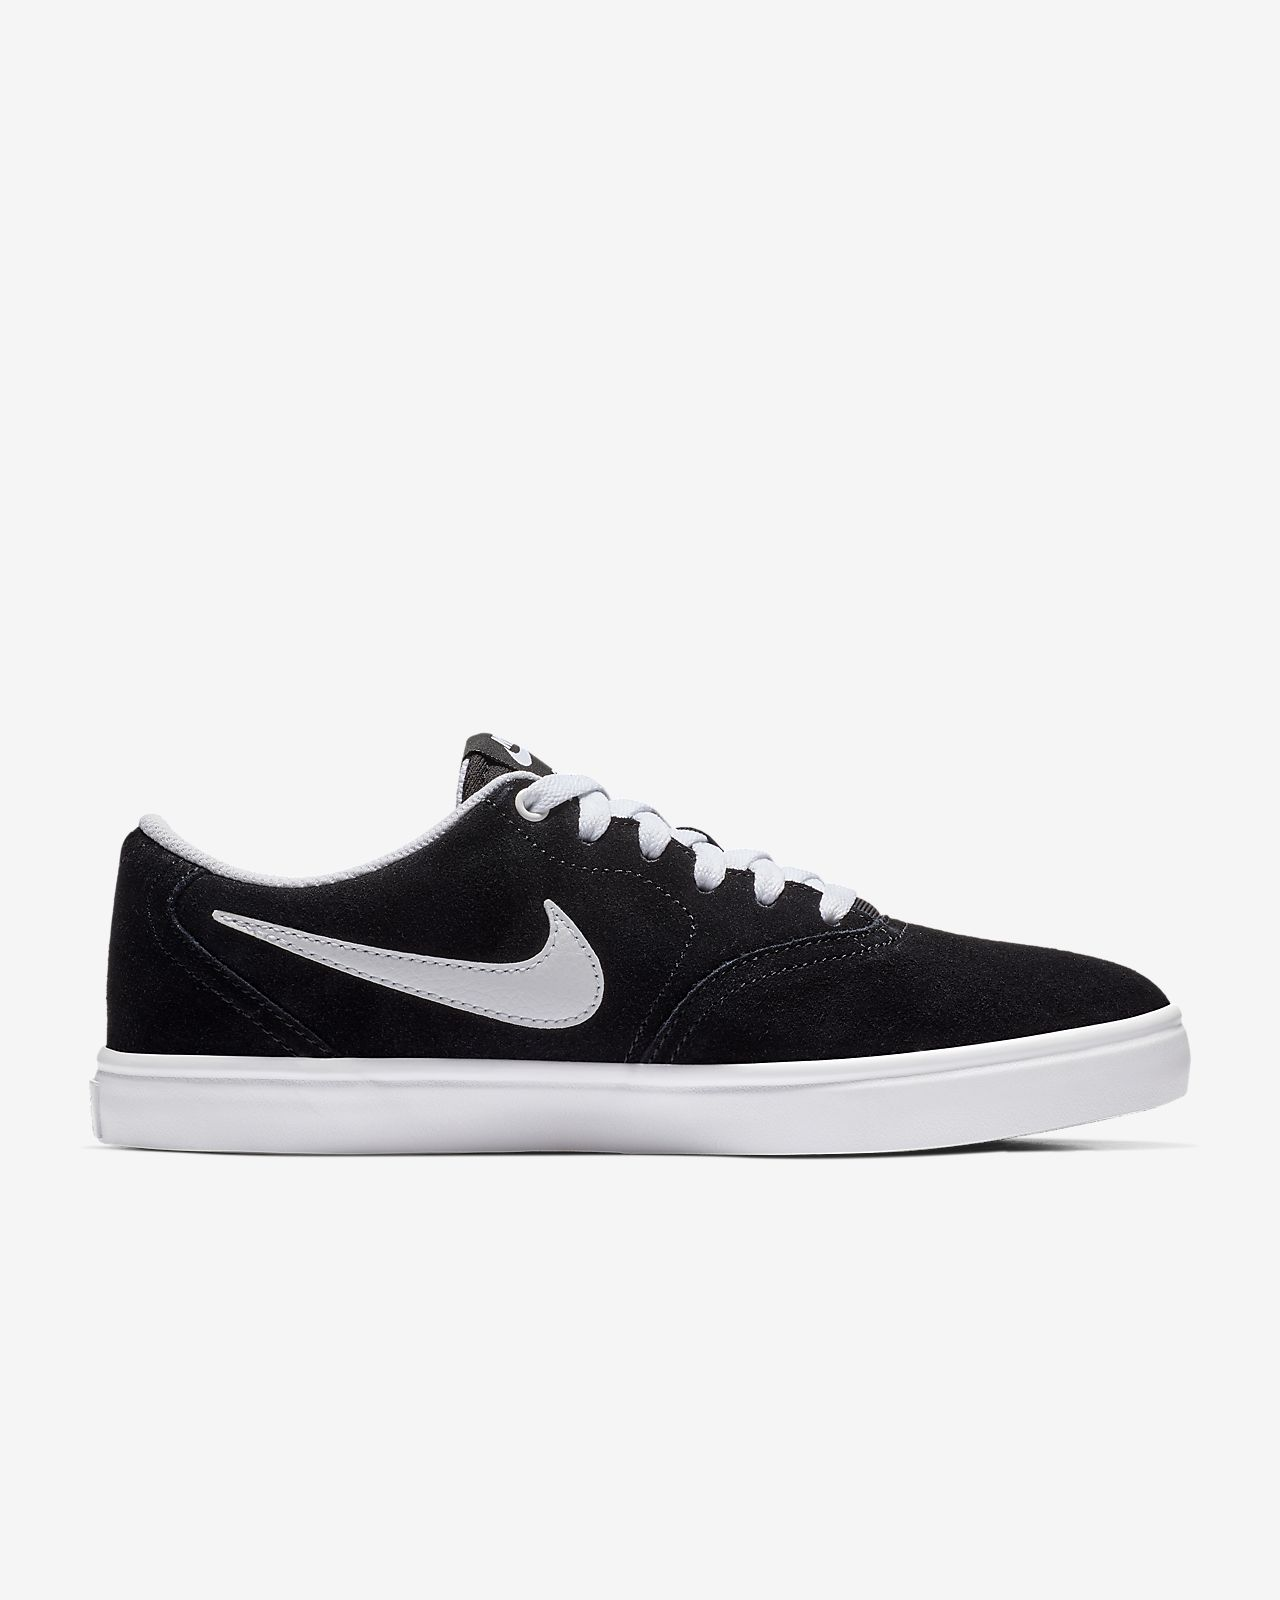 Nike Nike SB Check Solarsoft Women's Skate Shoes, Size: 6, Black from Kohl's   more